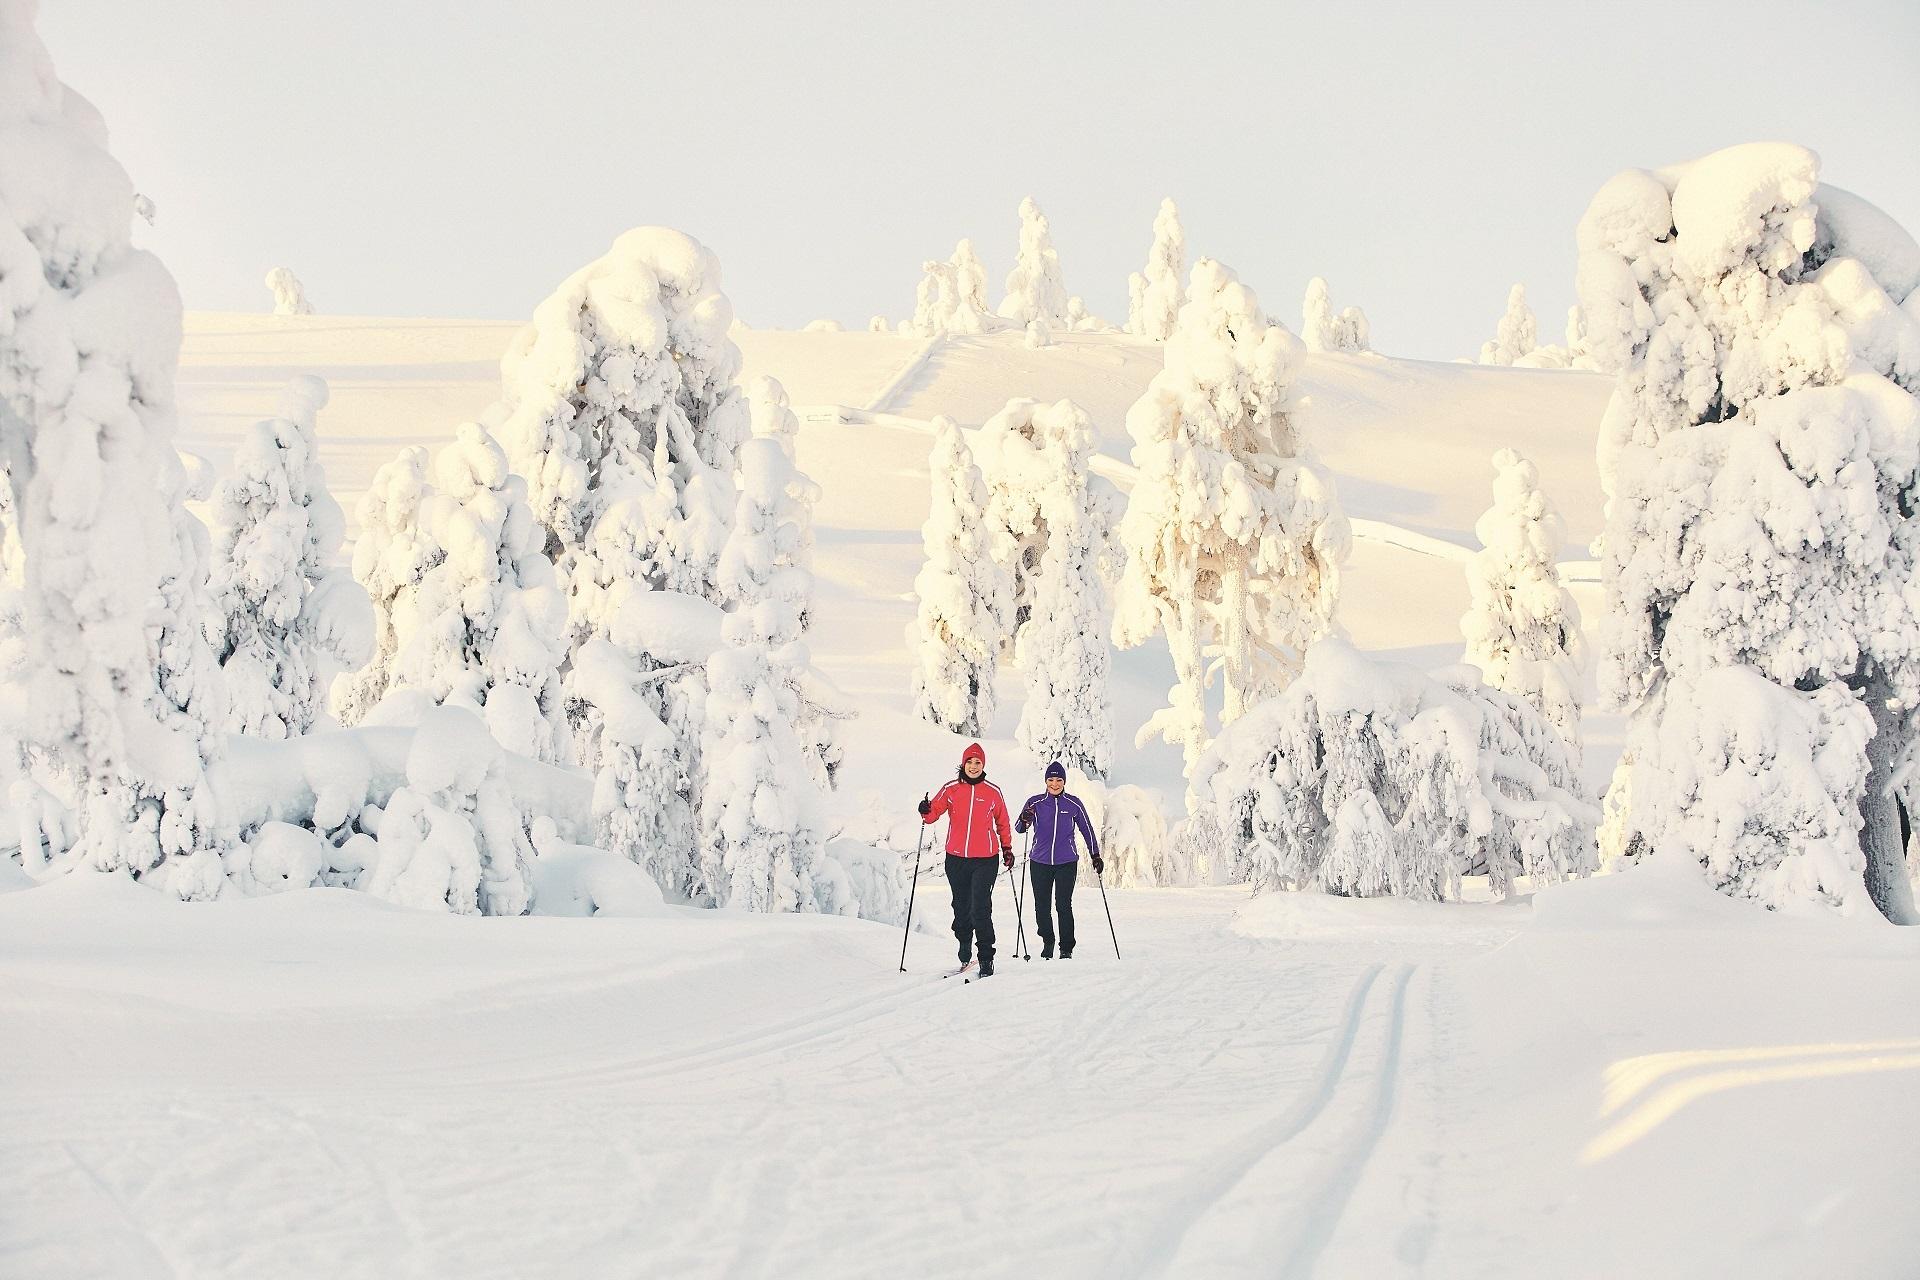 La piste de ski de fond traverse la forêt enchantée !